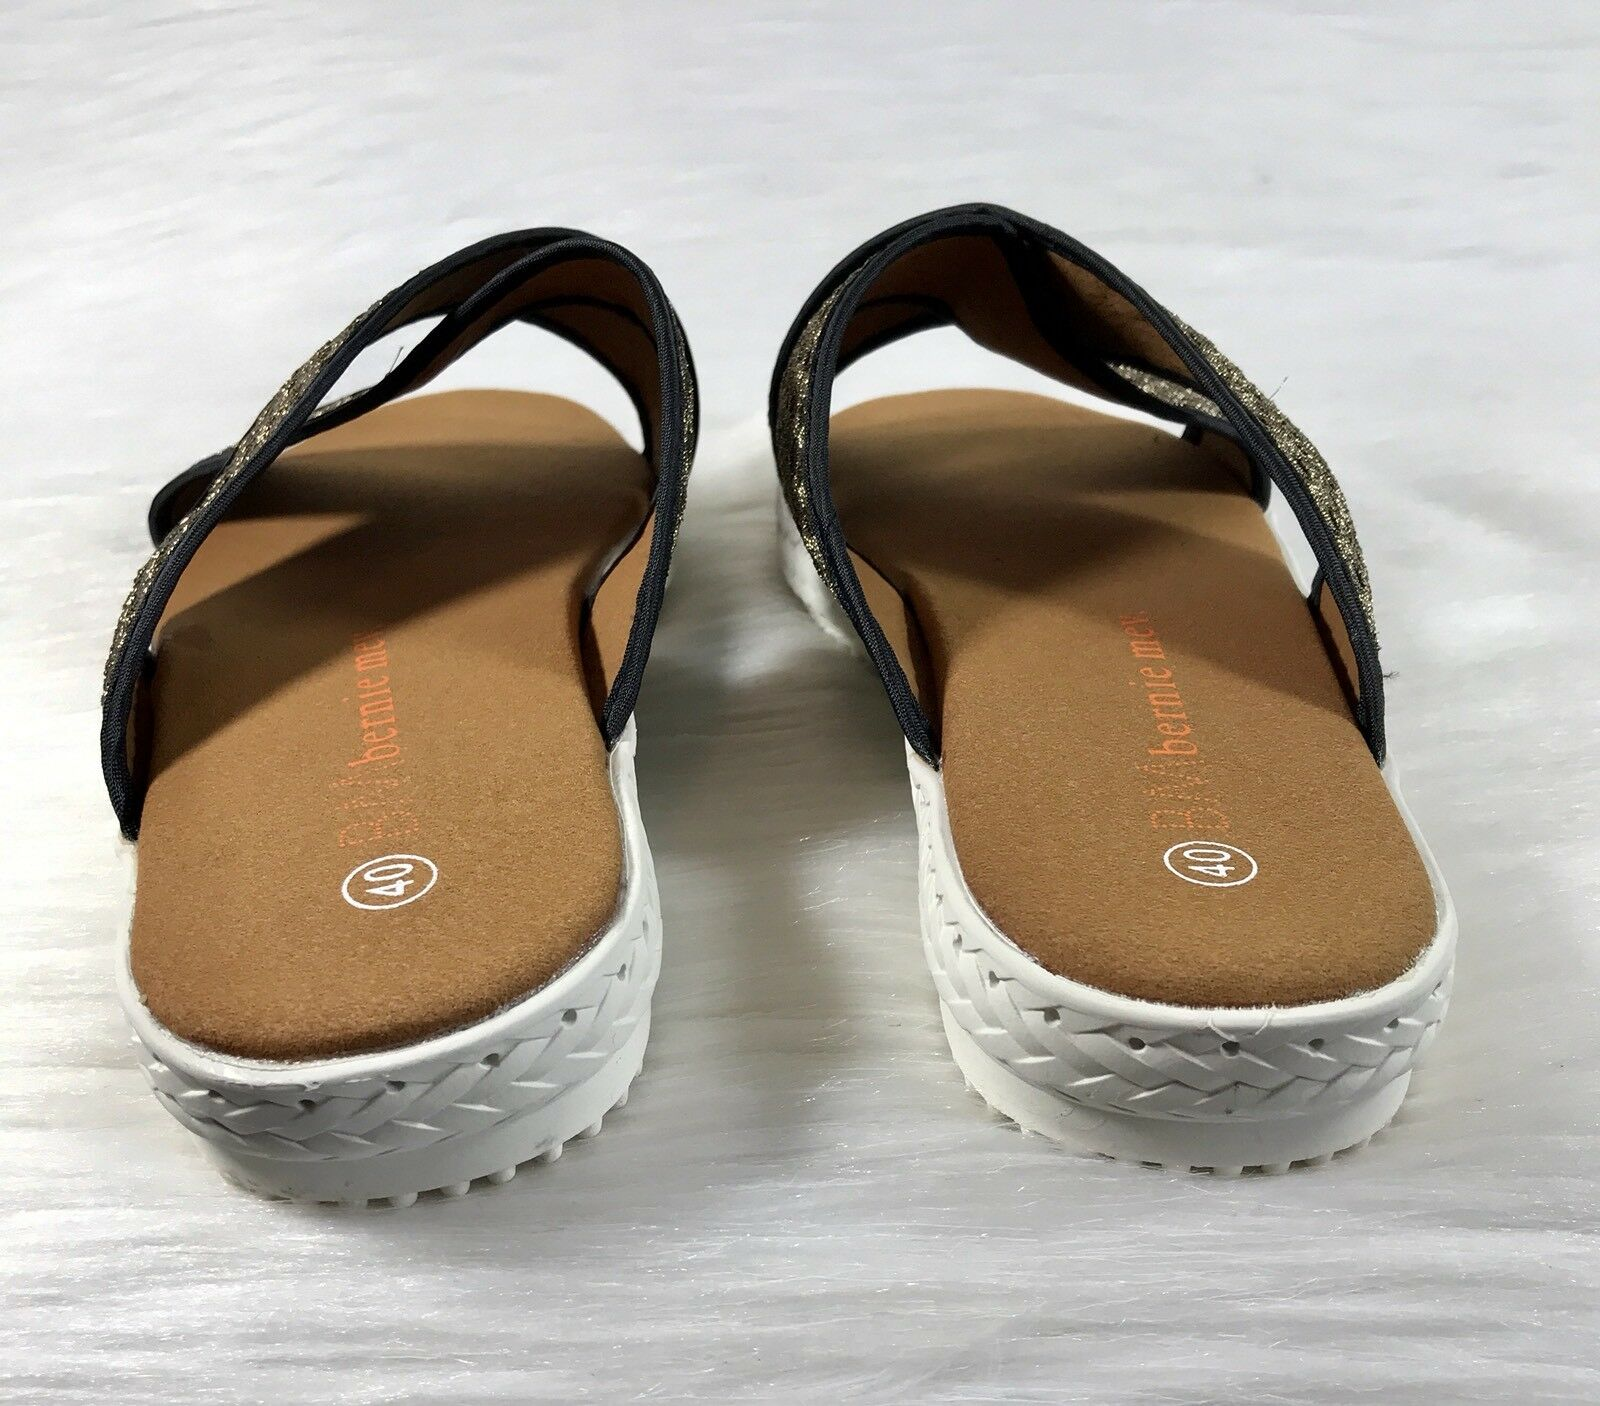 New Bernie Mev Mev Mev Avon Women's Sandals Slides Bronze Size 40 US 9.5-10 feb681